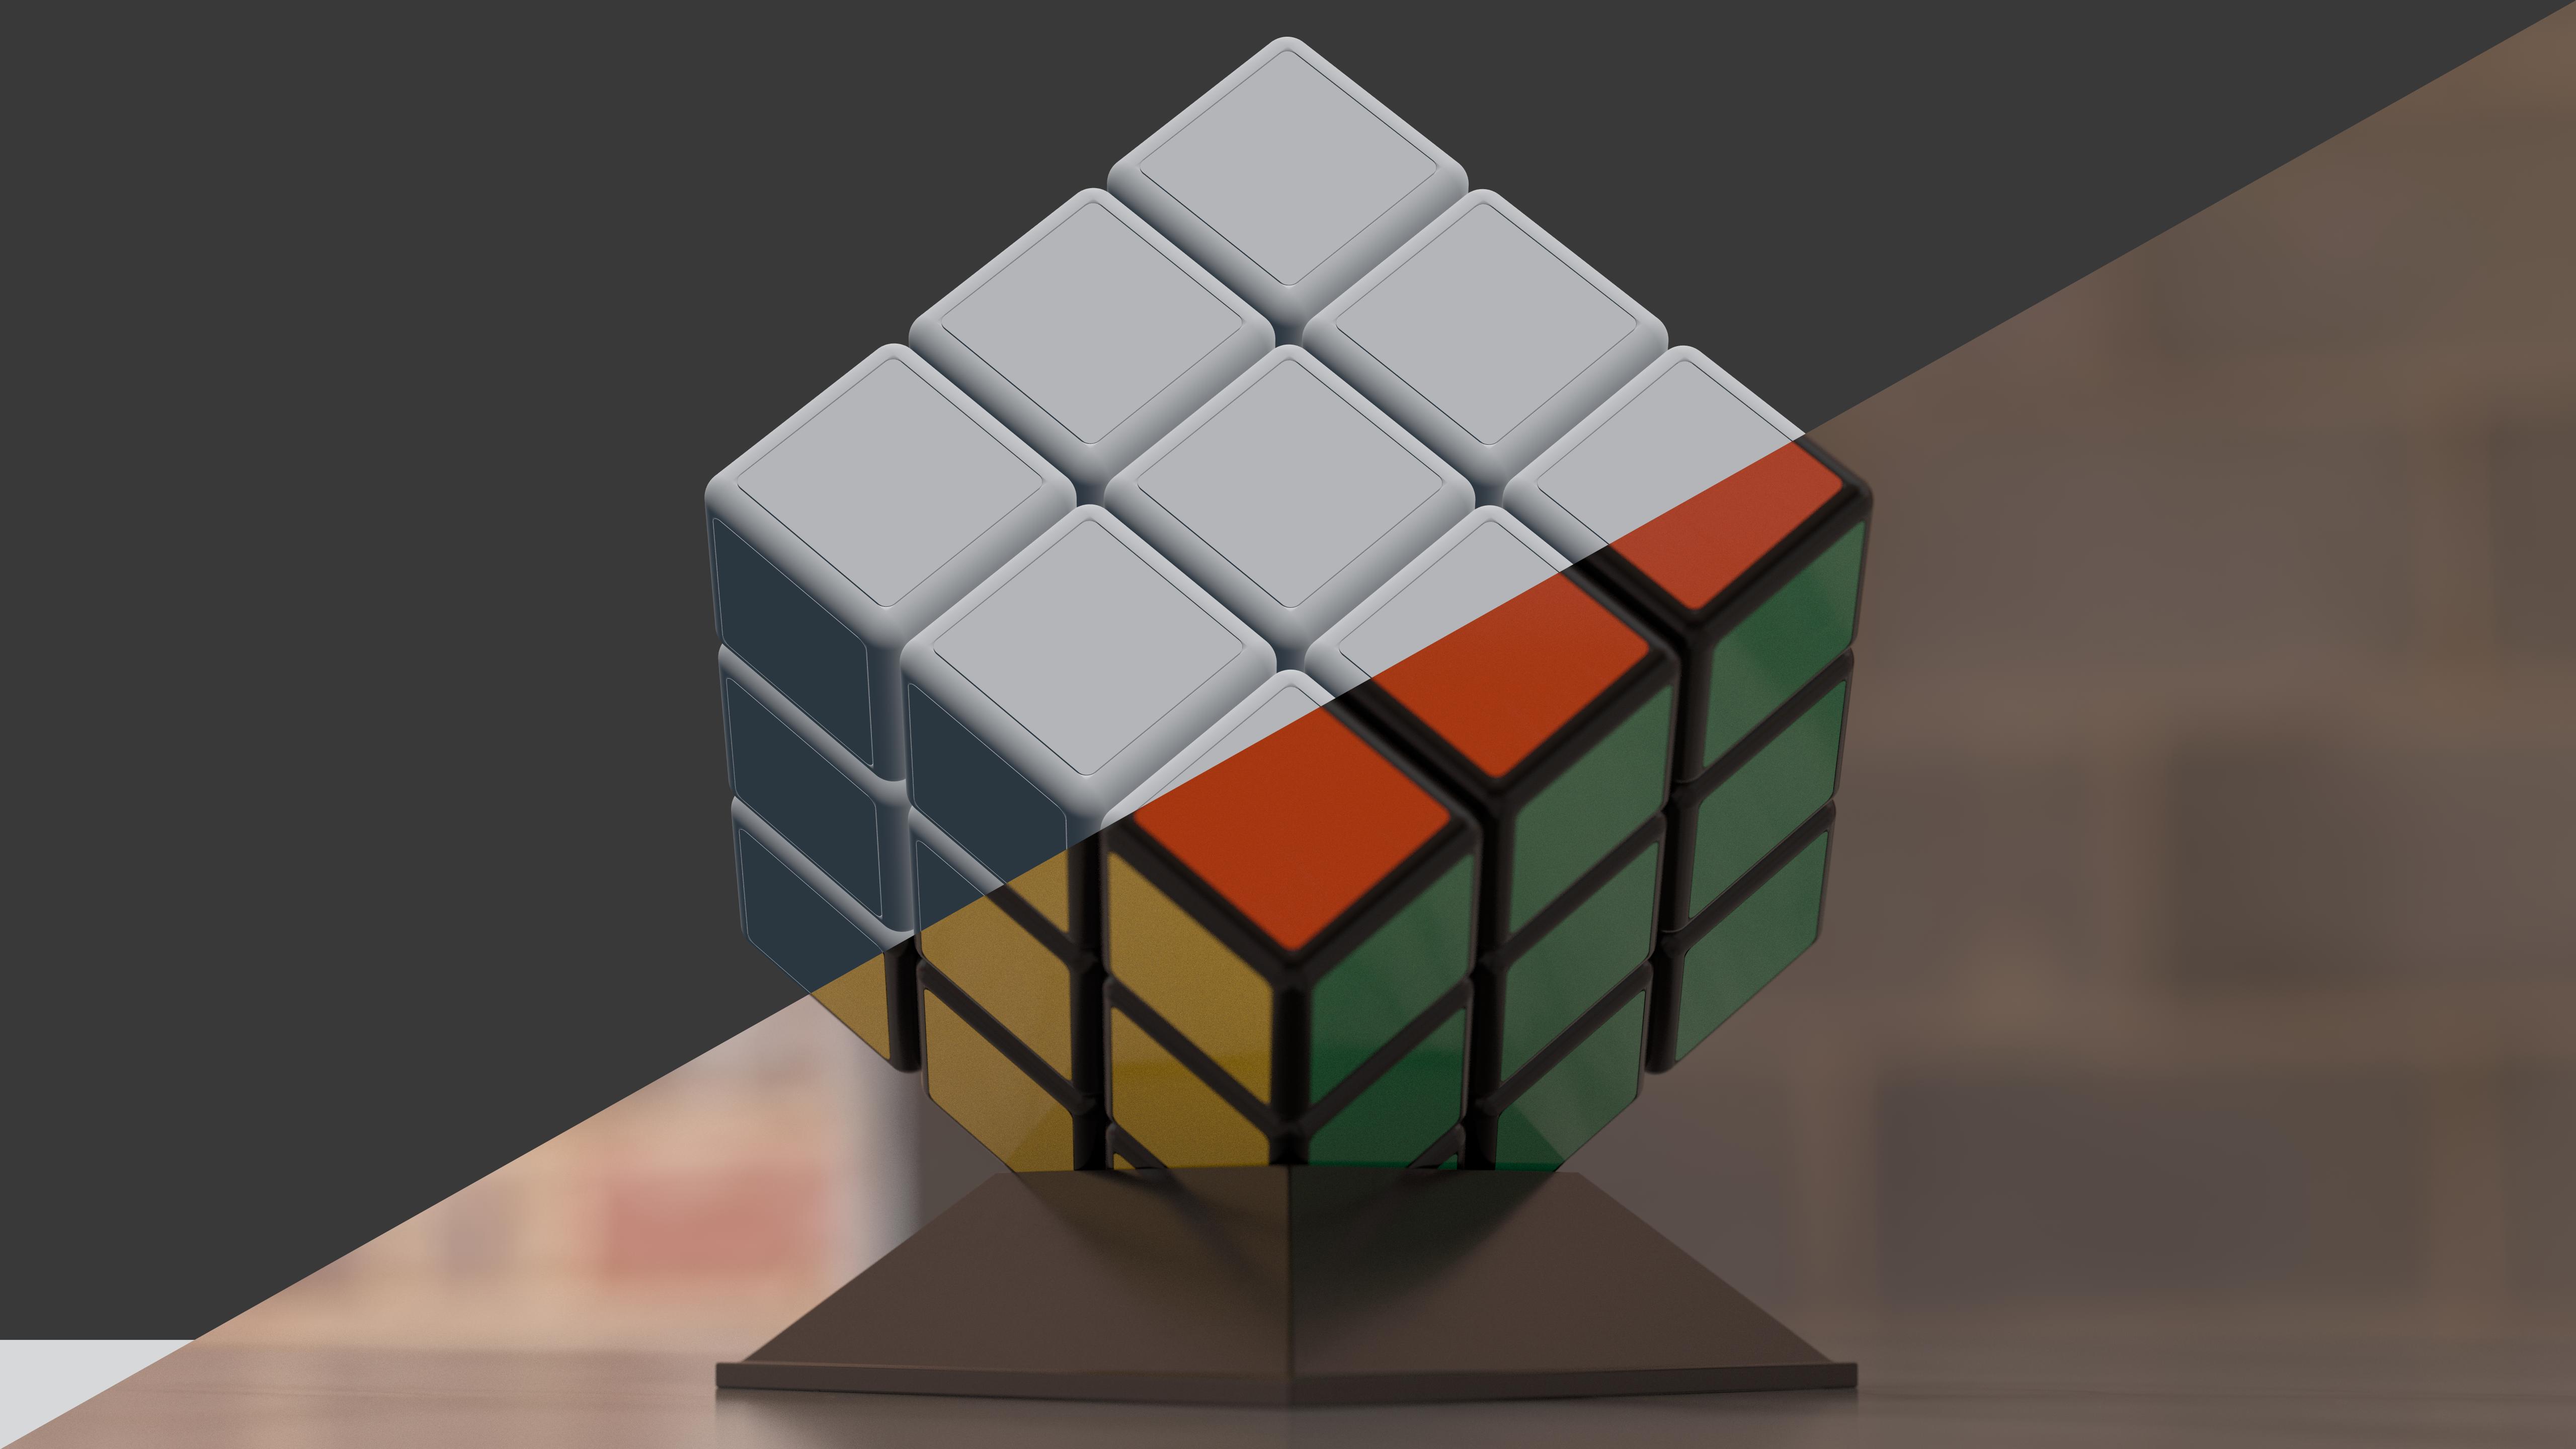 Rubik's Cube Animation Breakdown